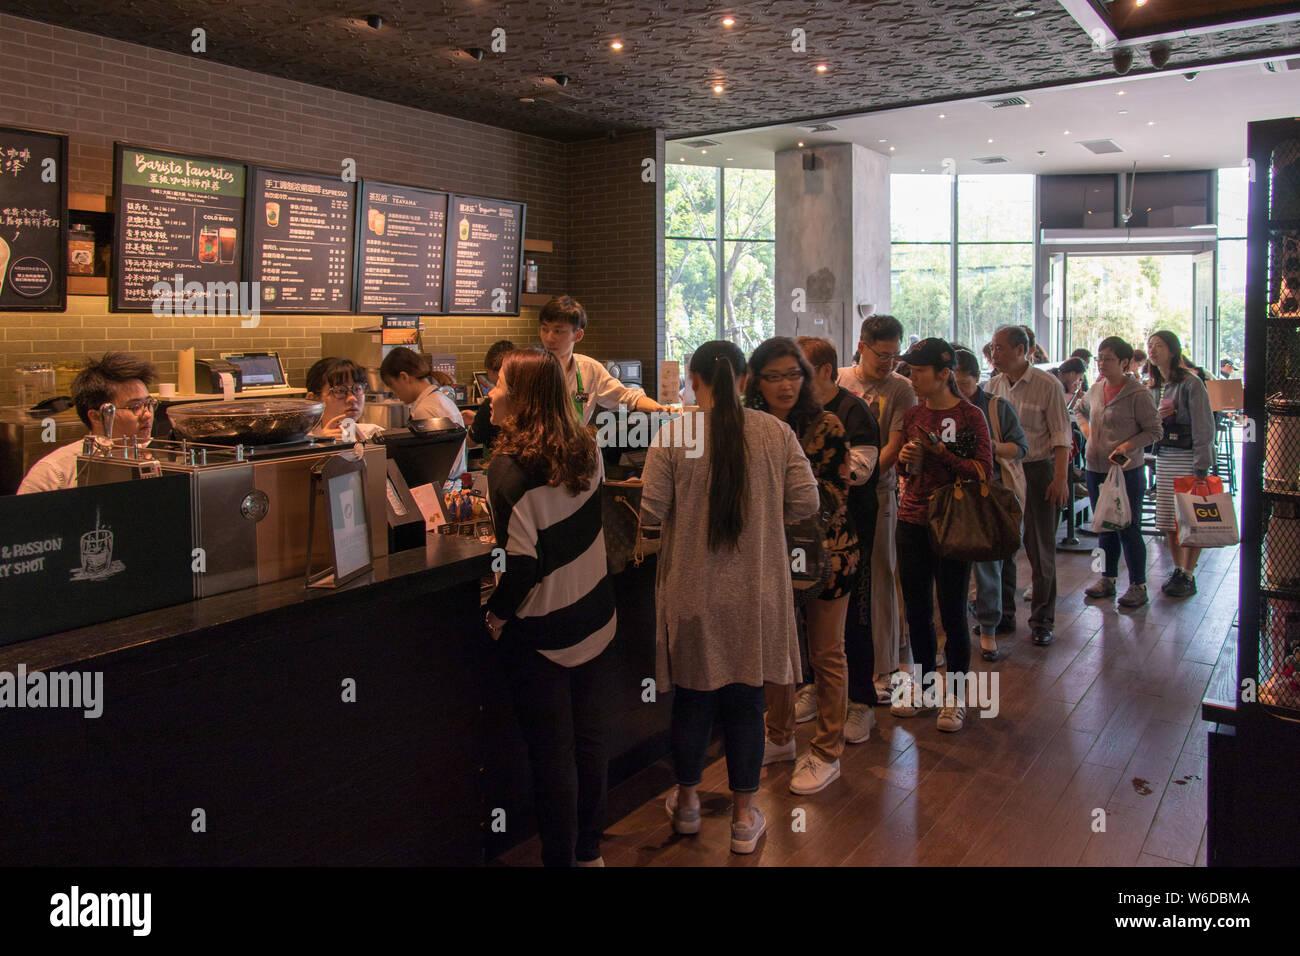 Free Coffee Starbucks Stock Photos & Free Coffee Starbucks